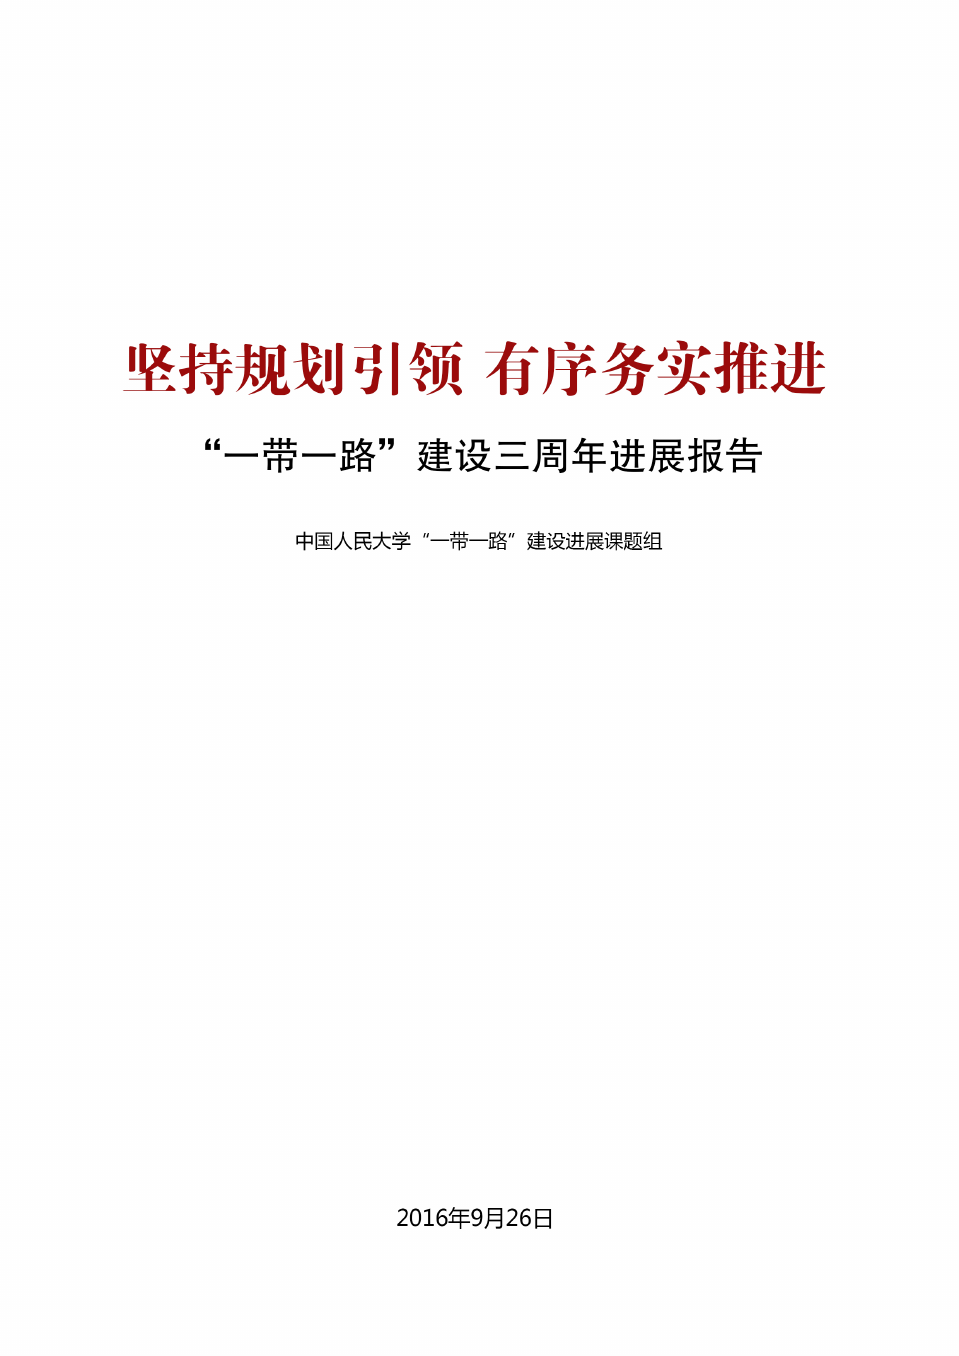 """一�б宦贰苯ㄔO三周年�M展�蟾�"